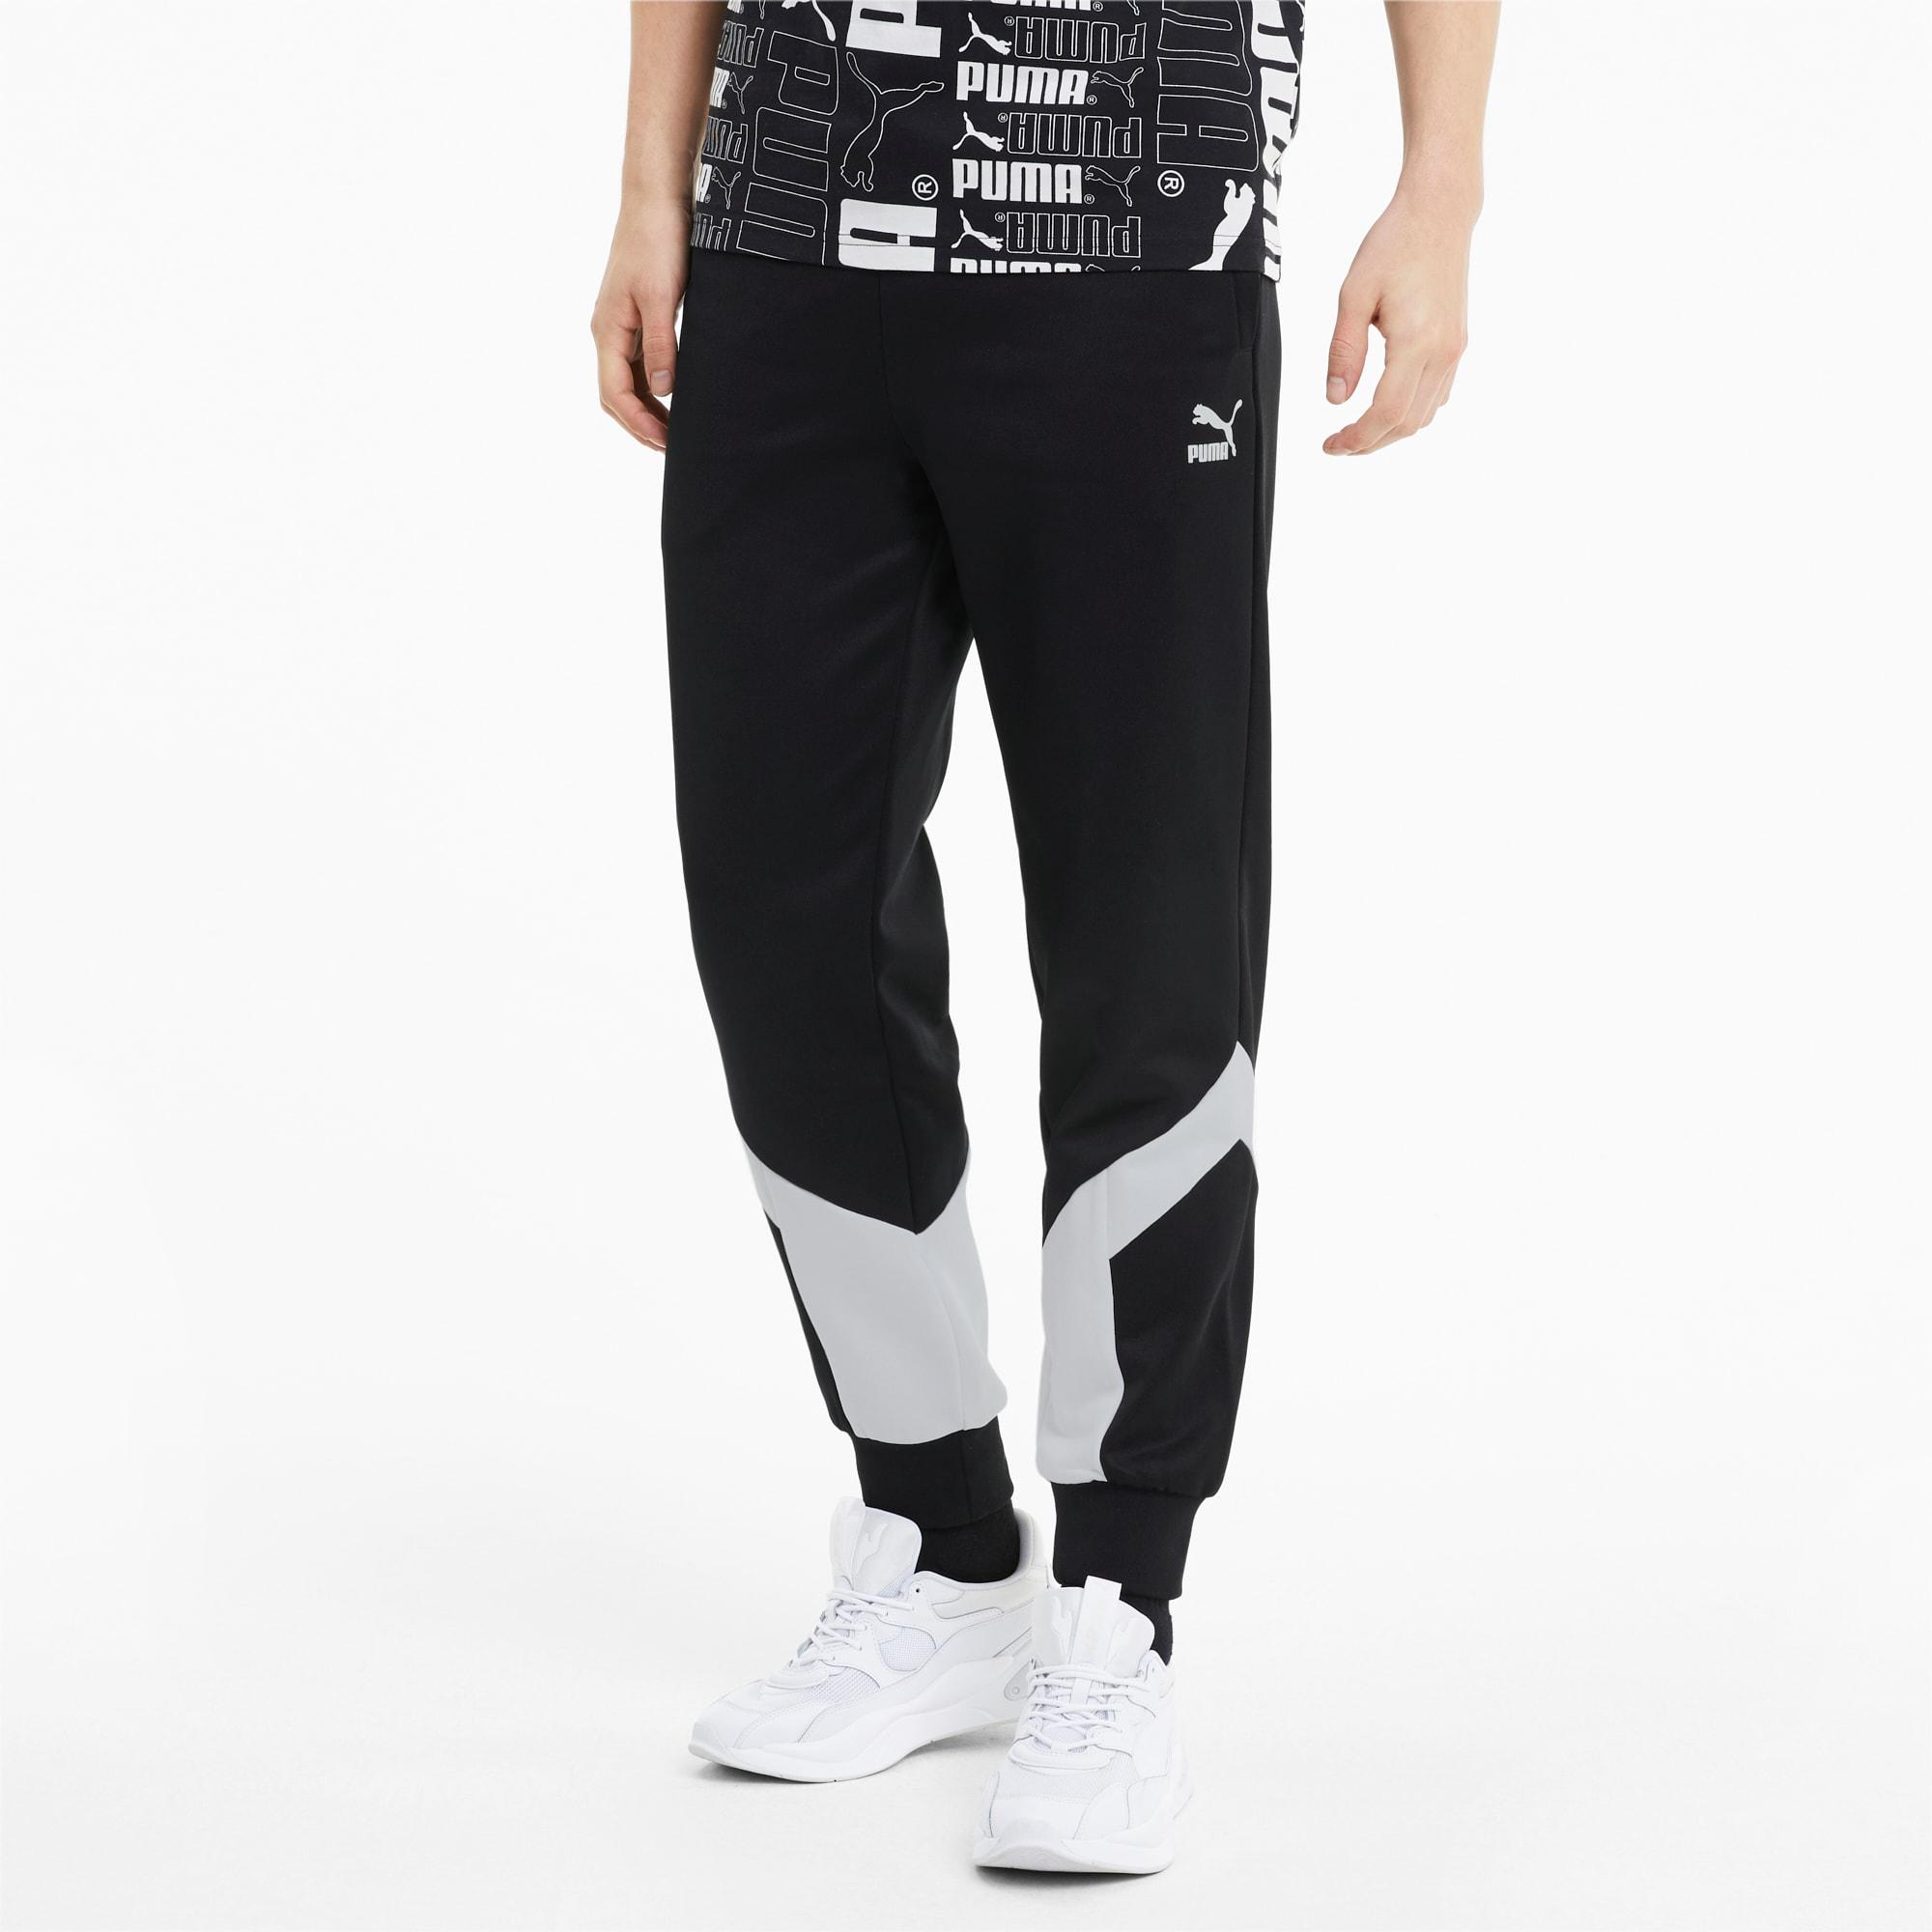 puma -  Iconic MCS Knitted Herren Trainingshose | Schwarz | Größe: M